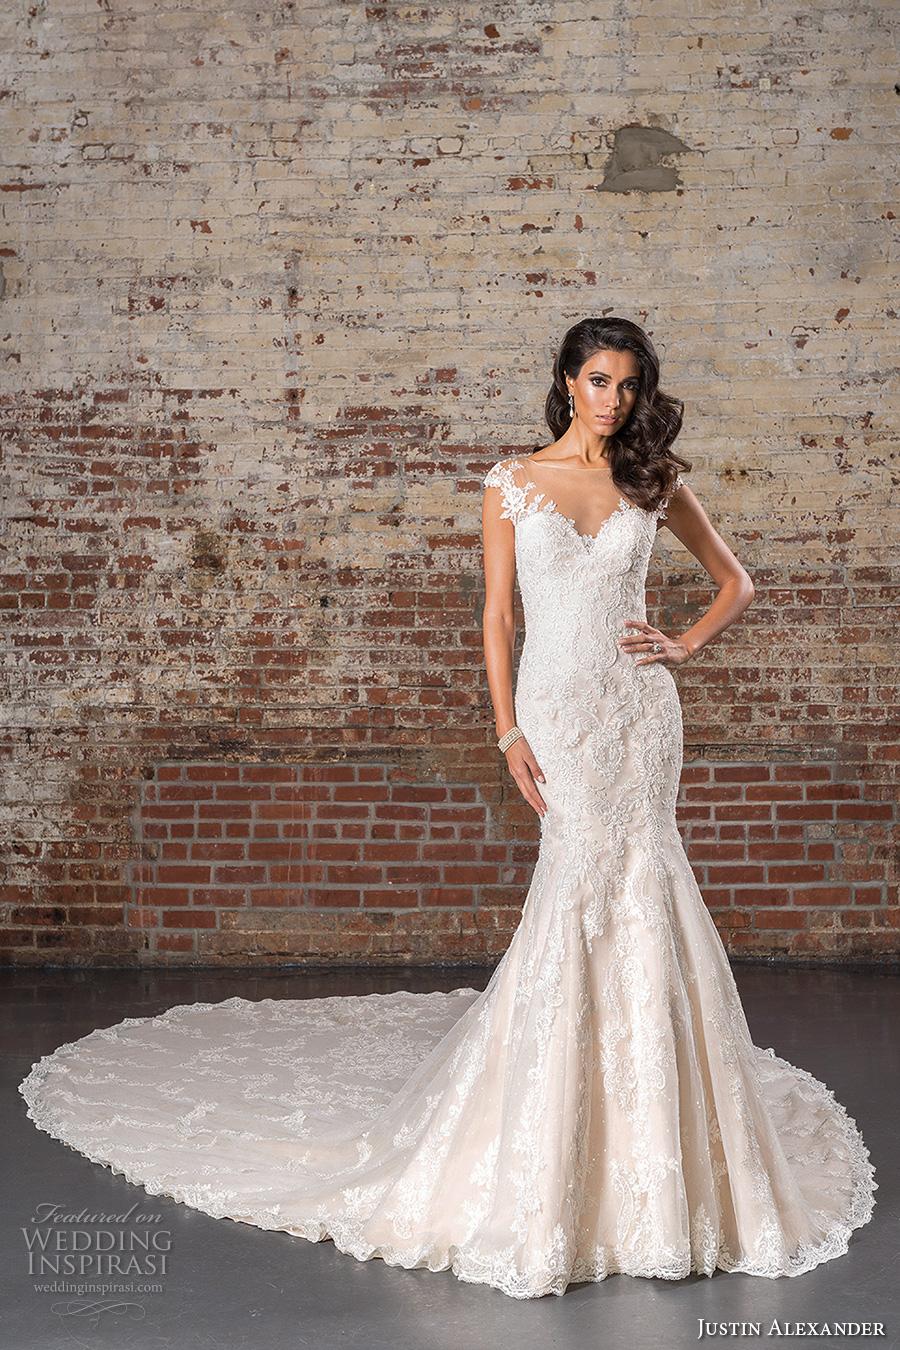 justin alexander spring 2017 bridal cap sleeves illusion boat sweetheart neckline fully embellished elegant classic mermaid wedding dress illusion back long royal train (9845) mv